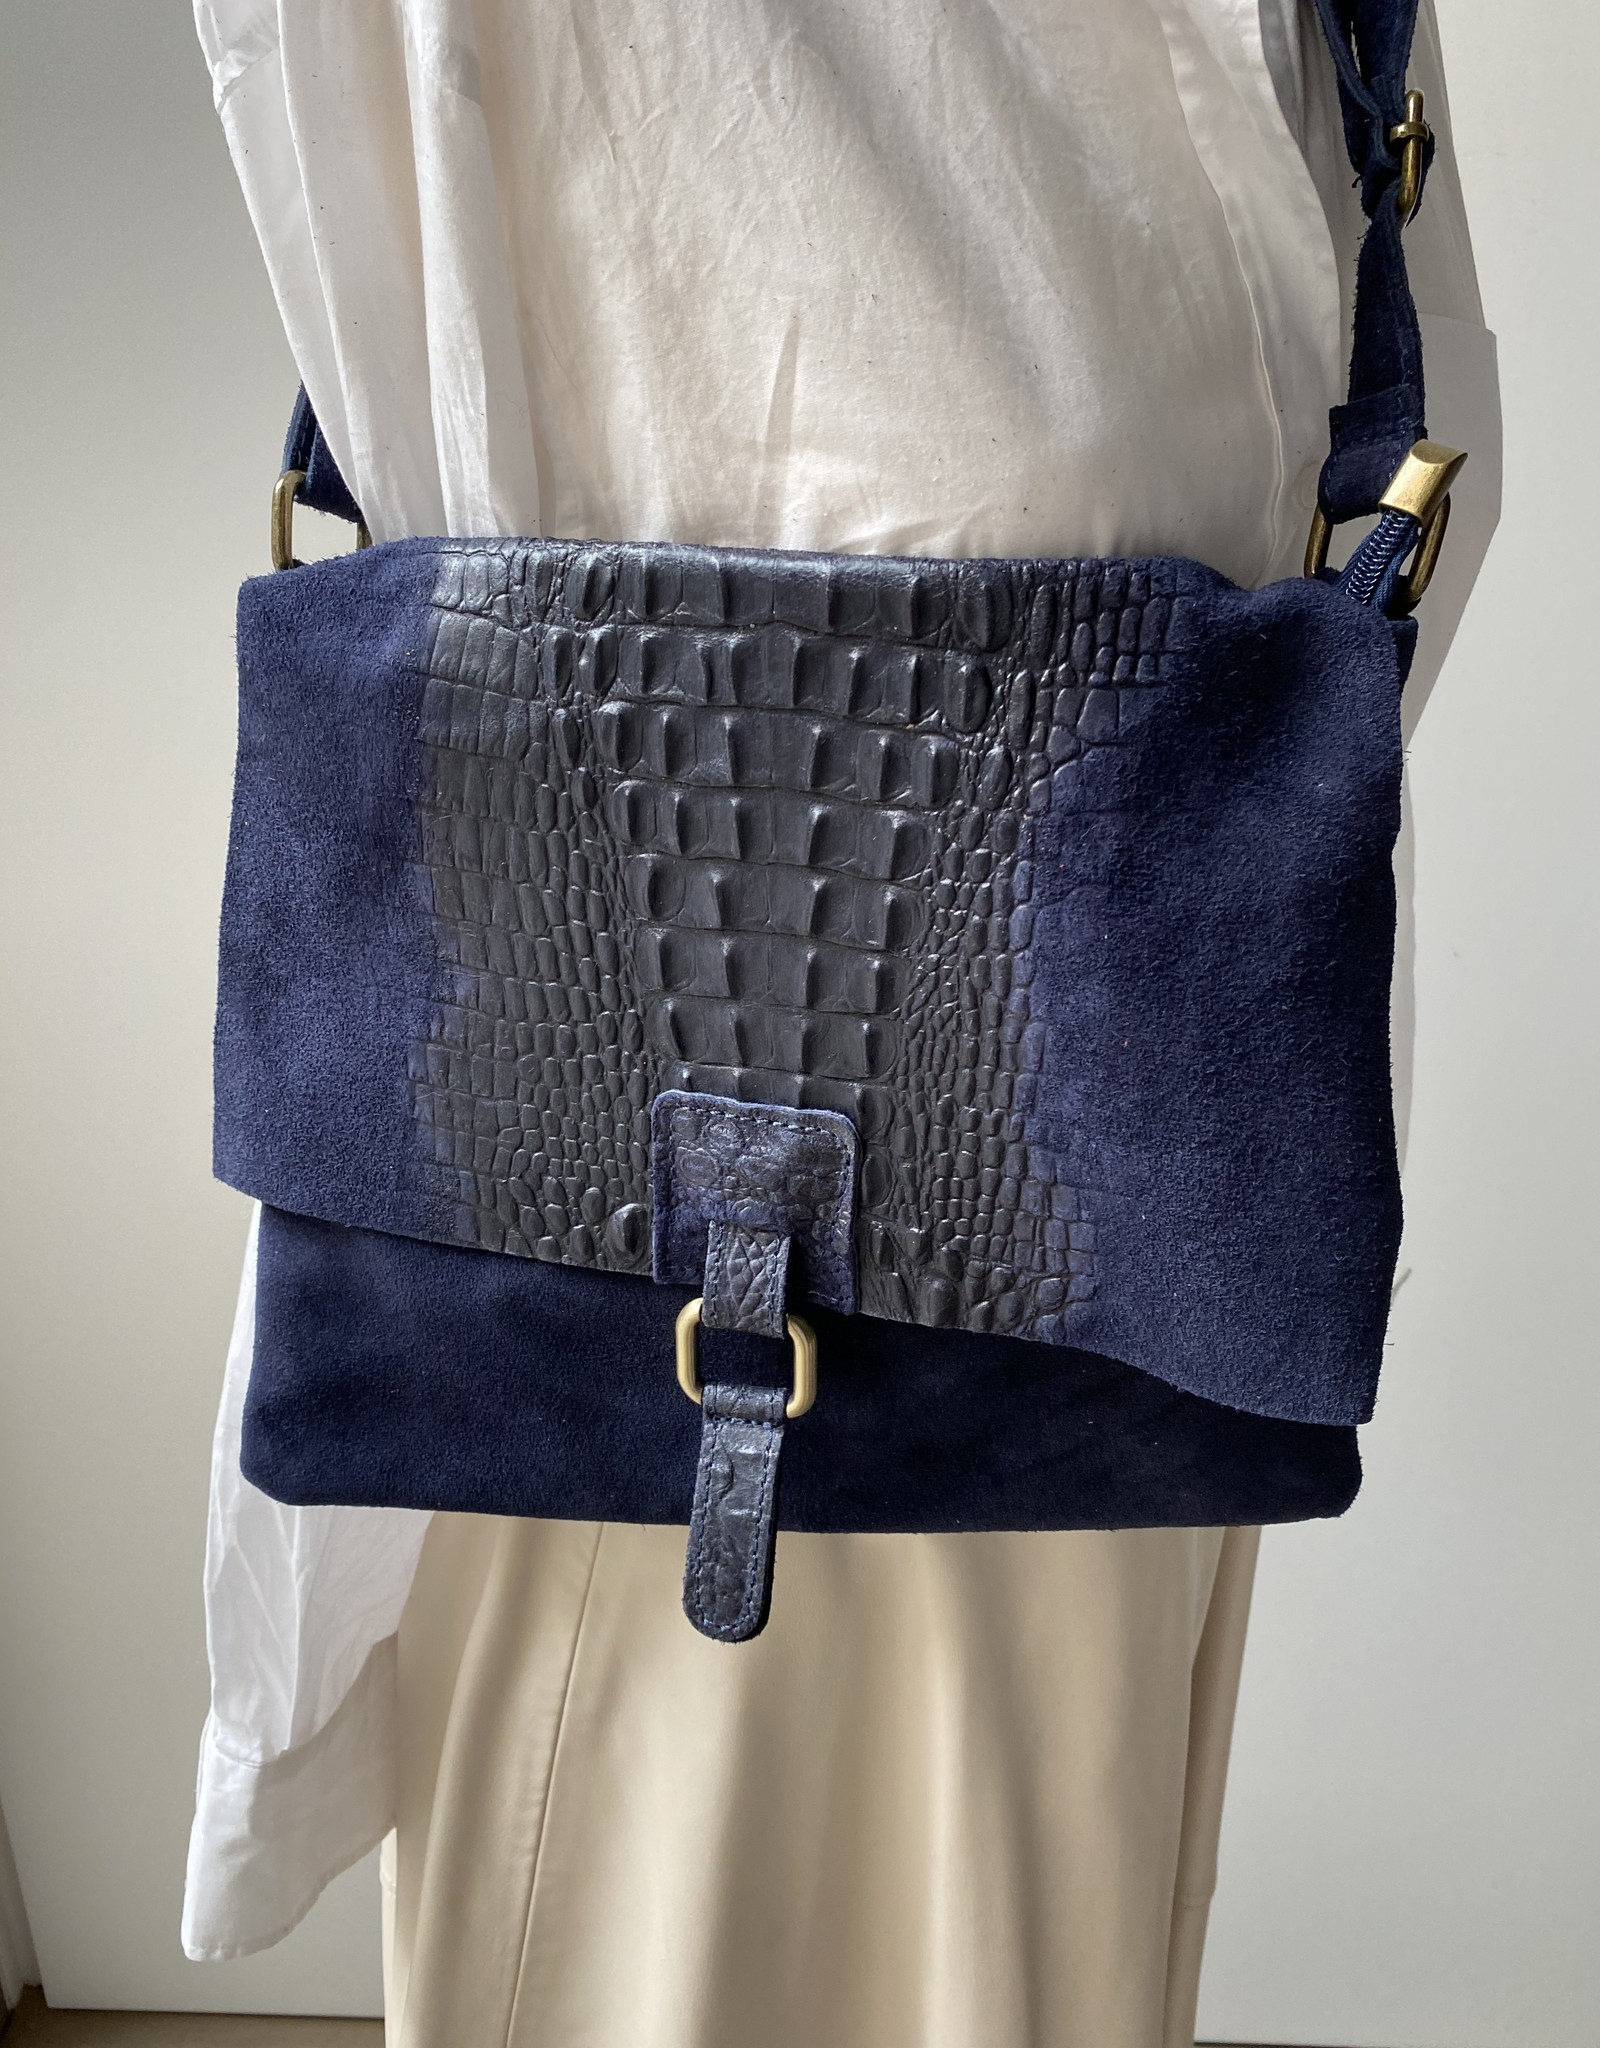 Daim/croco leder combinatie soepele tas in donkerblauw.